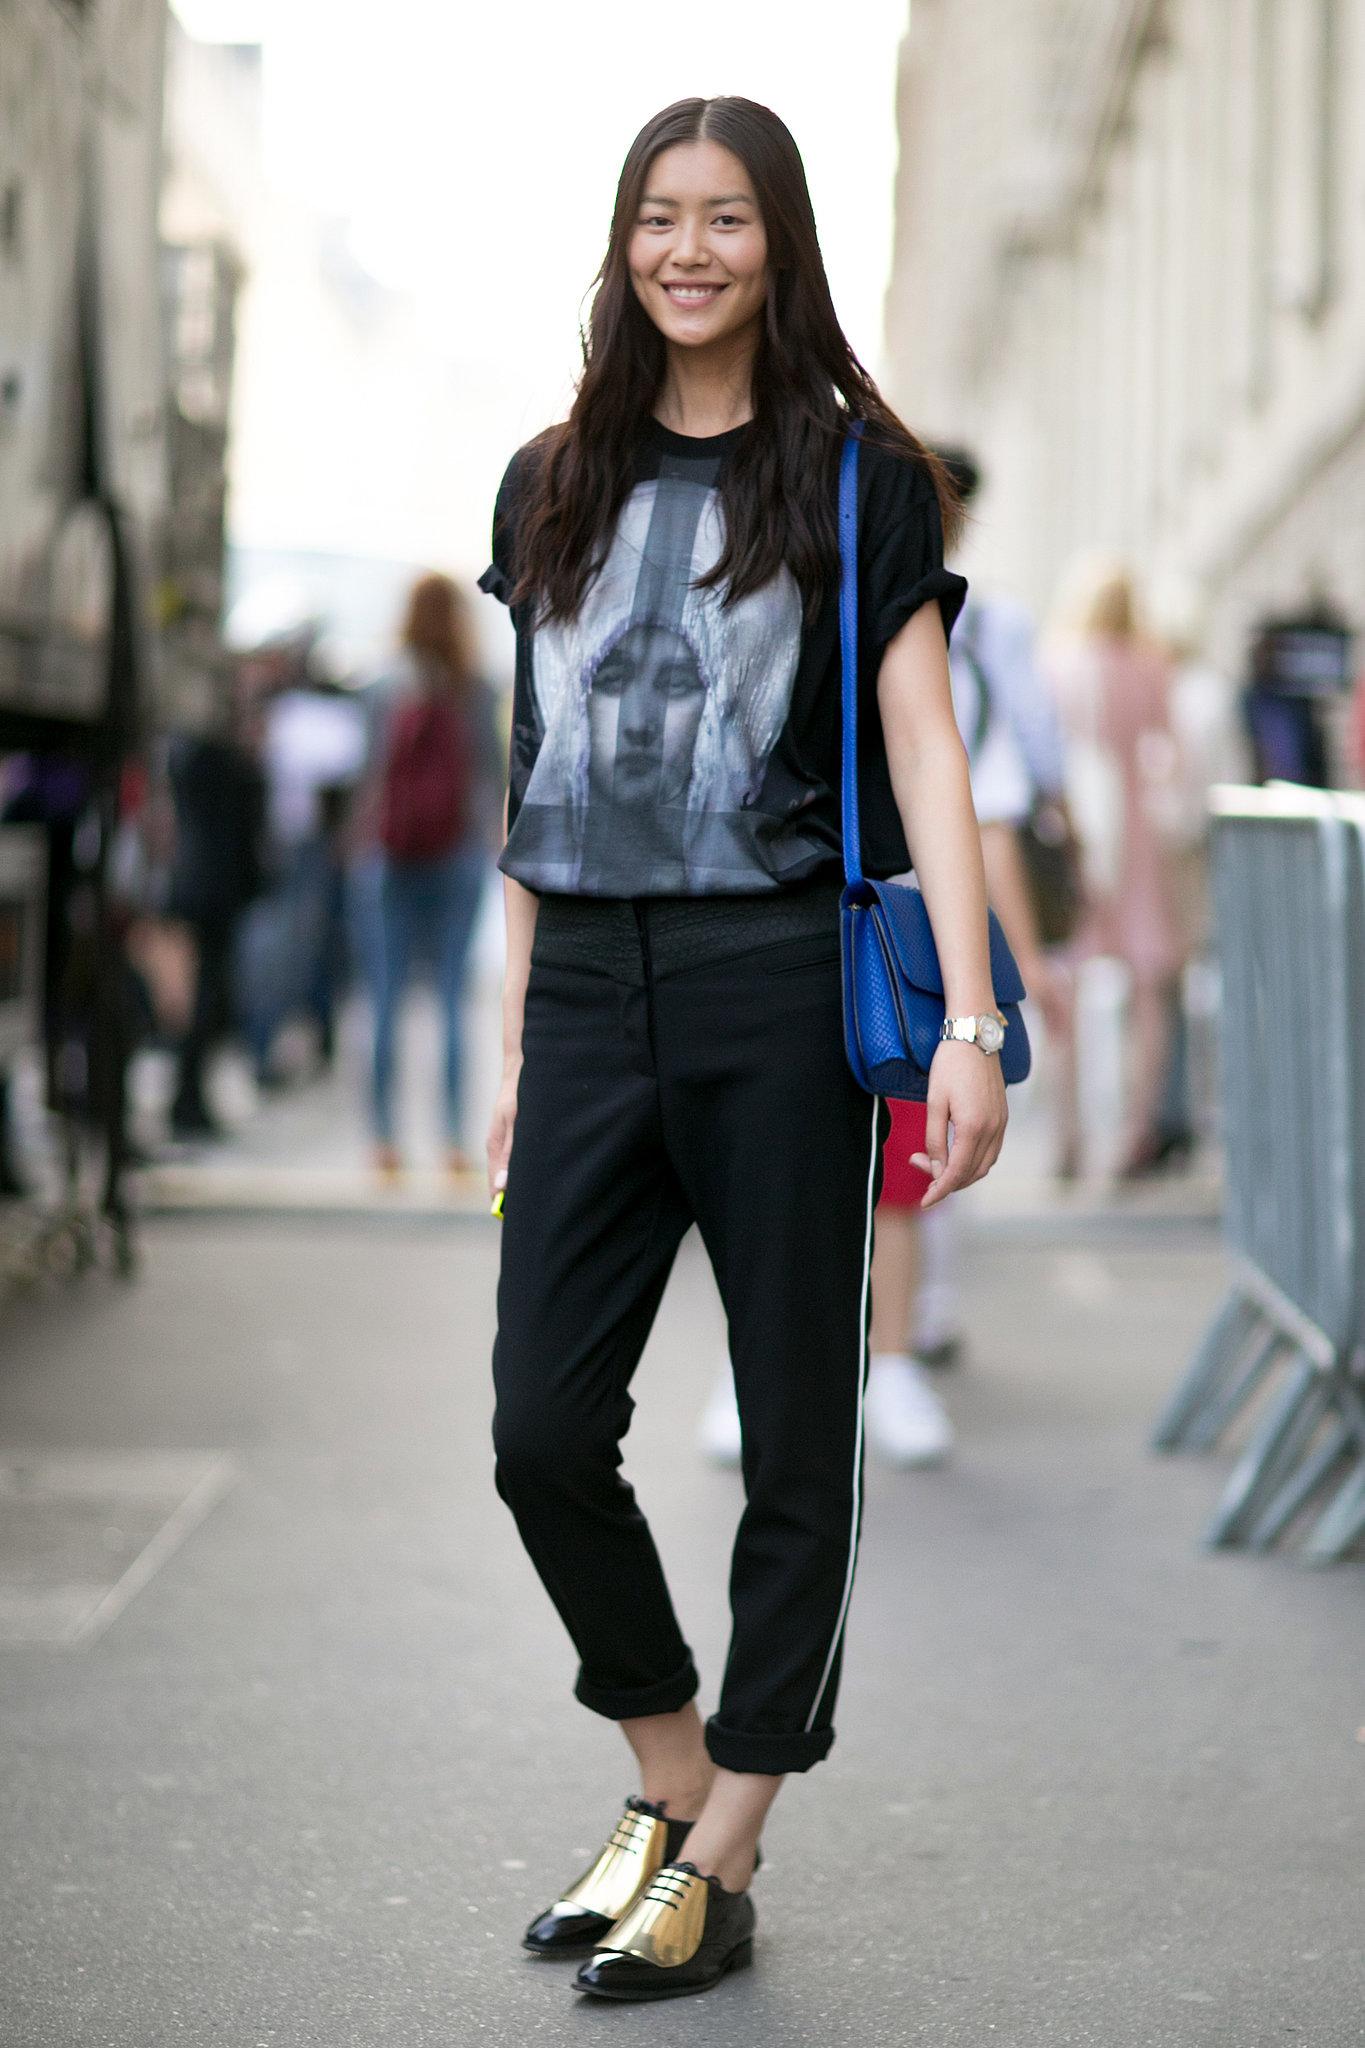 Liu-Wen-styles-up-her-look-snazzy-kicks